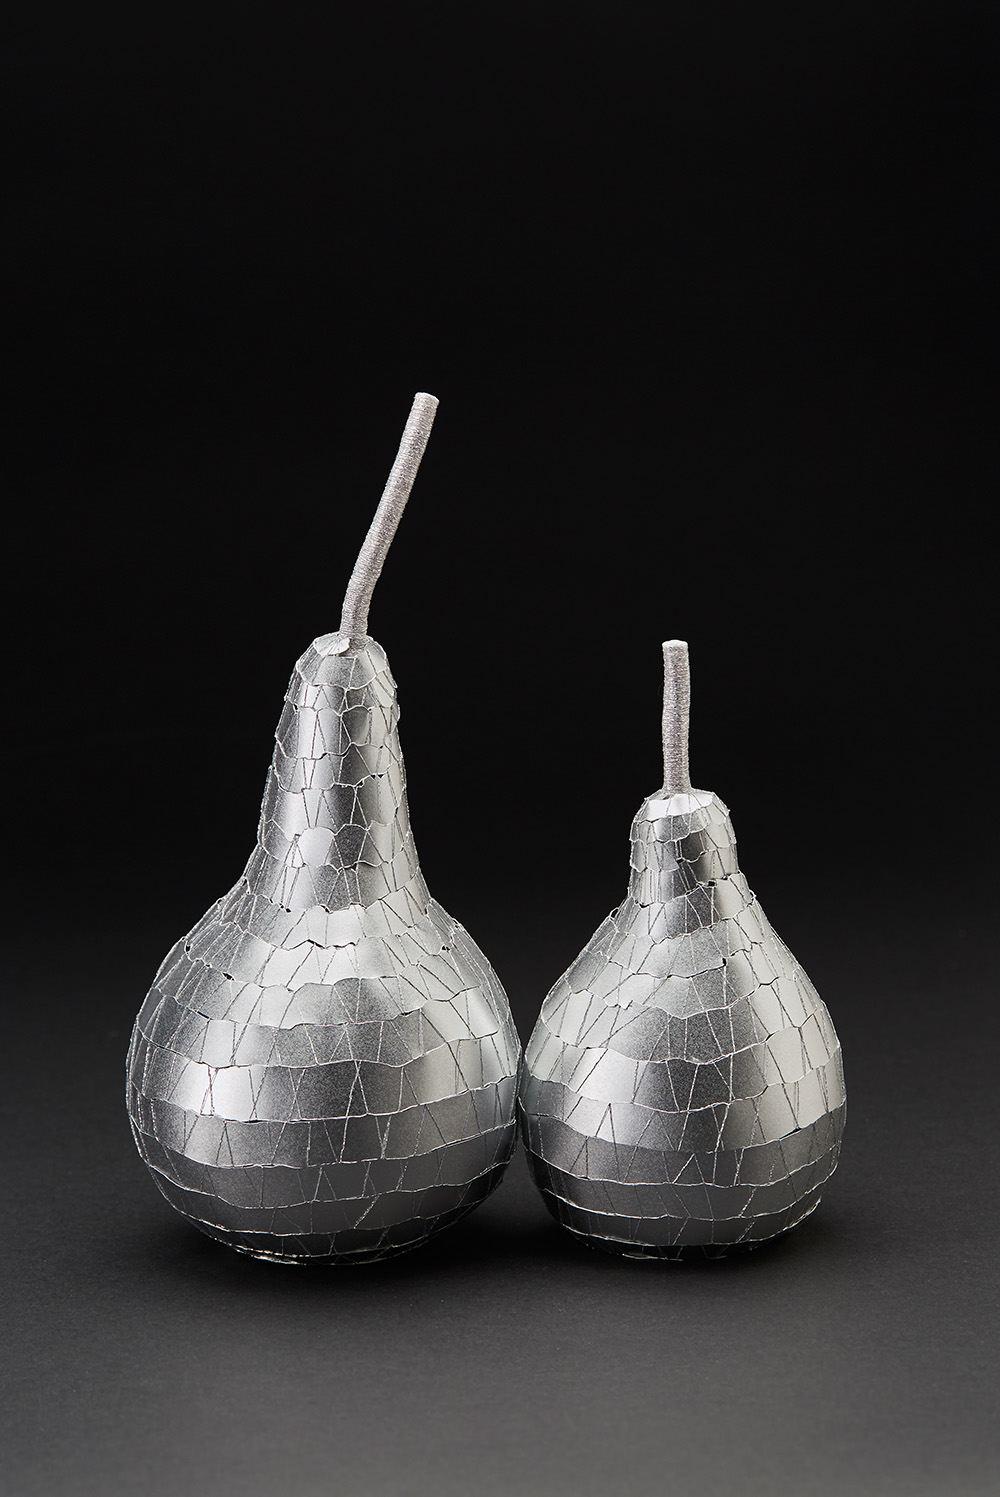 Yohko Kubo  Modeled after.... Gourd  , 2018 Aluminum paper, polyester yarn a. 26 x 11 x 11 cm b. 18 x 9 x 9 Kub 3